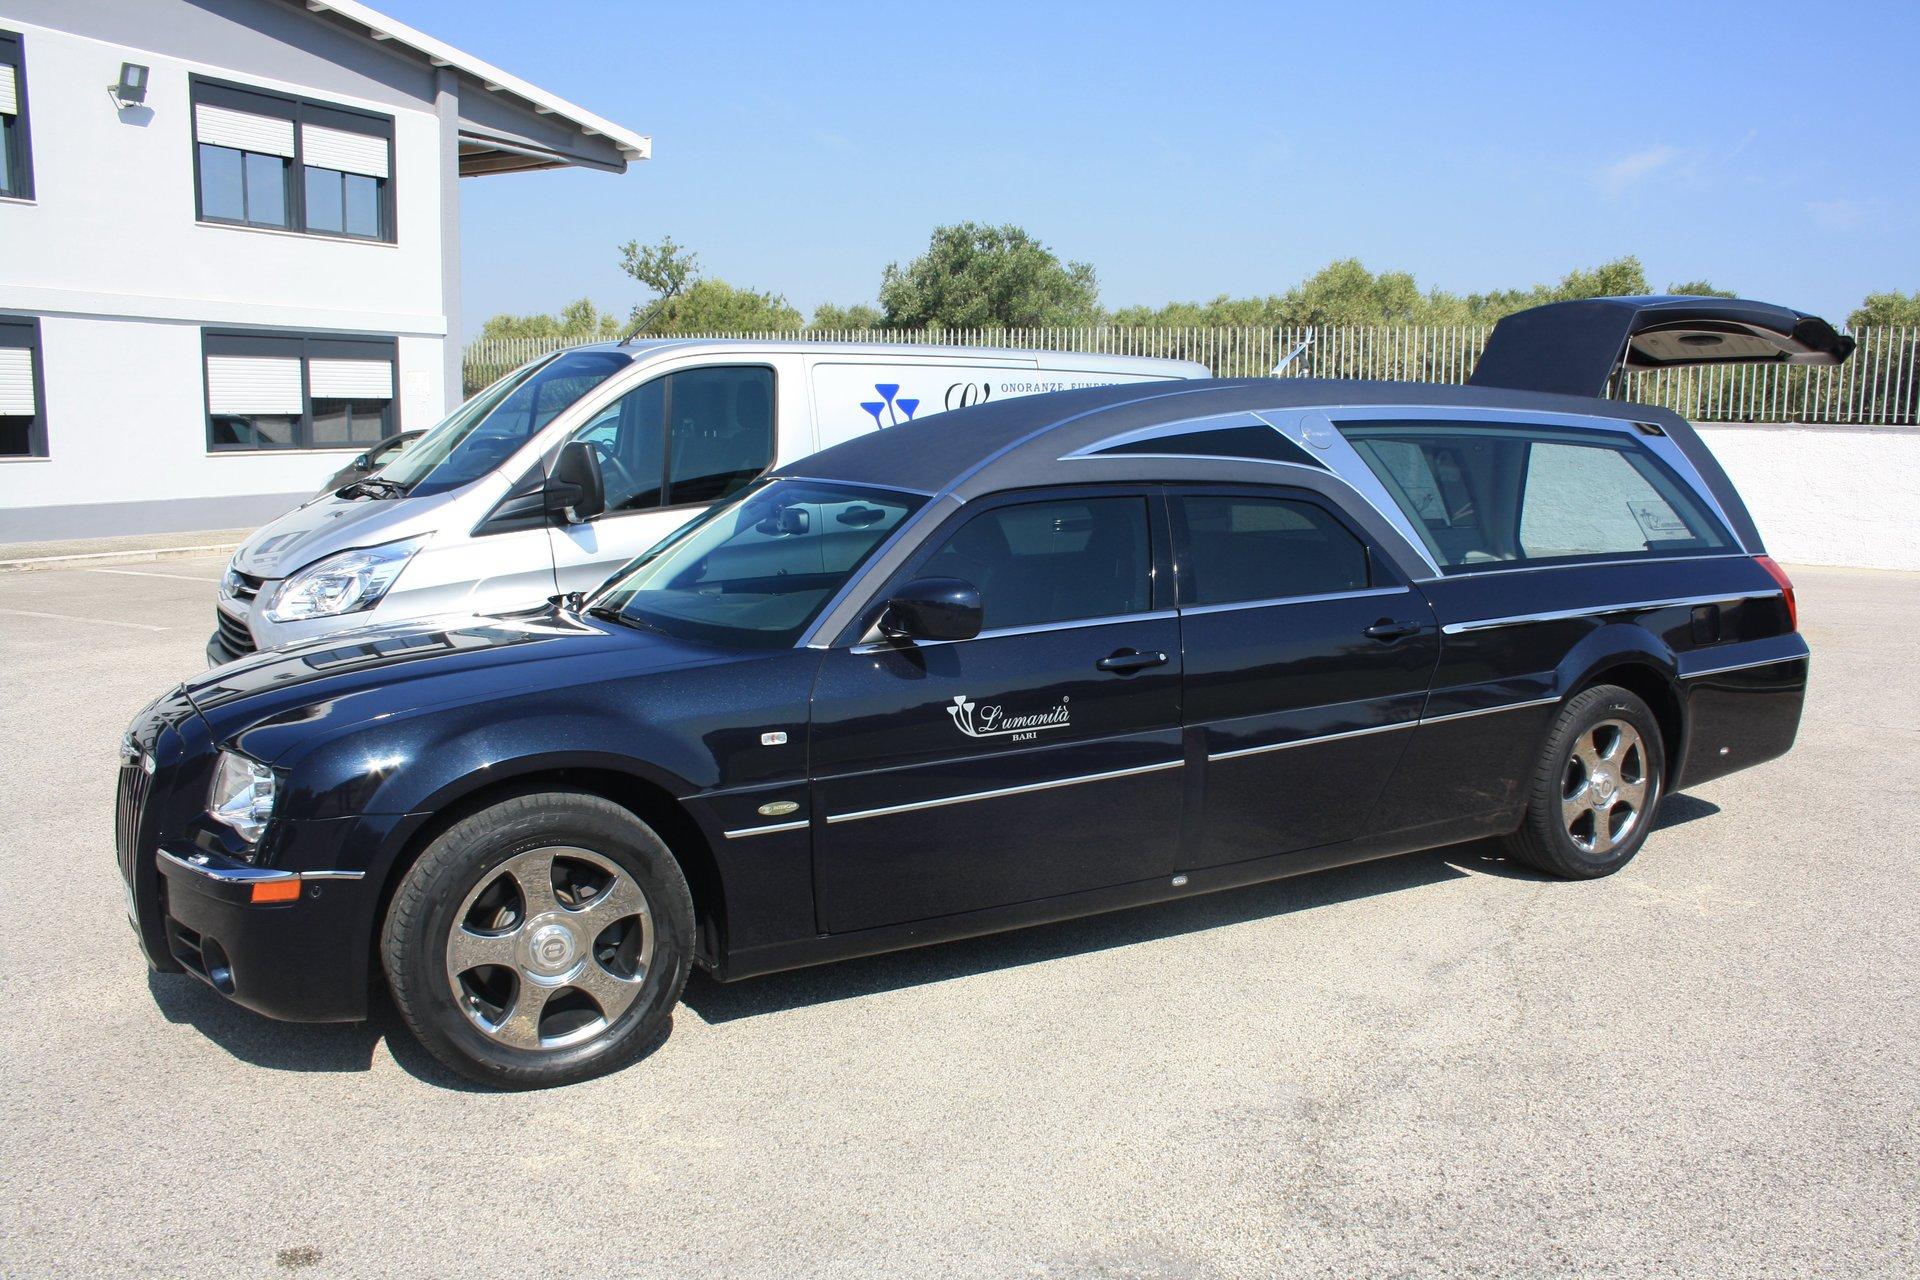 un carro funebre blu scuro